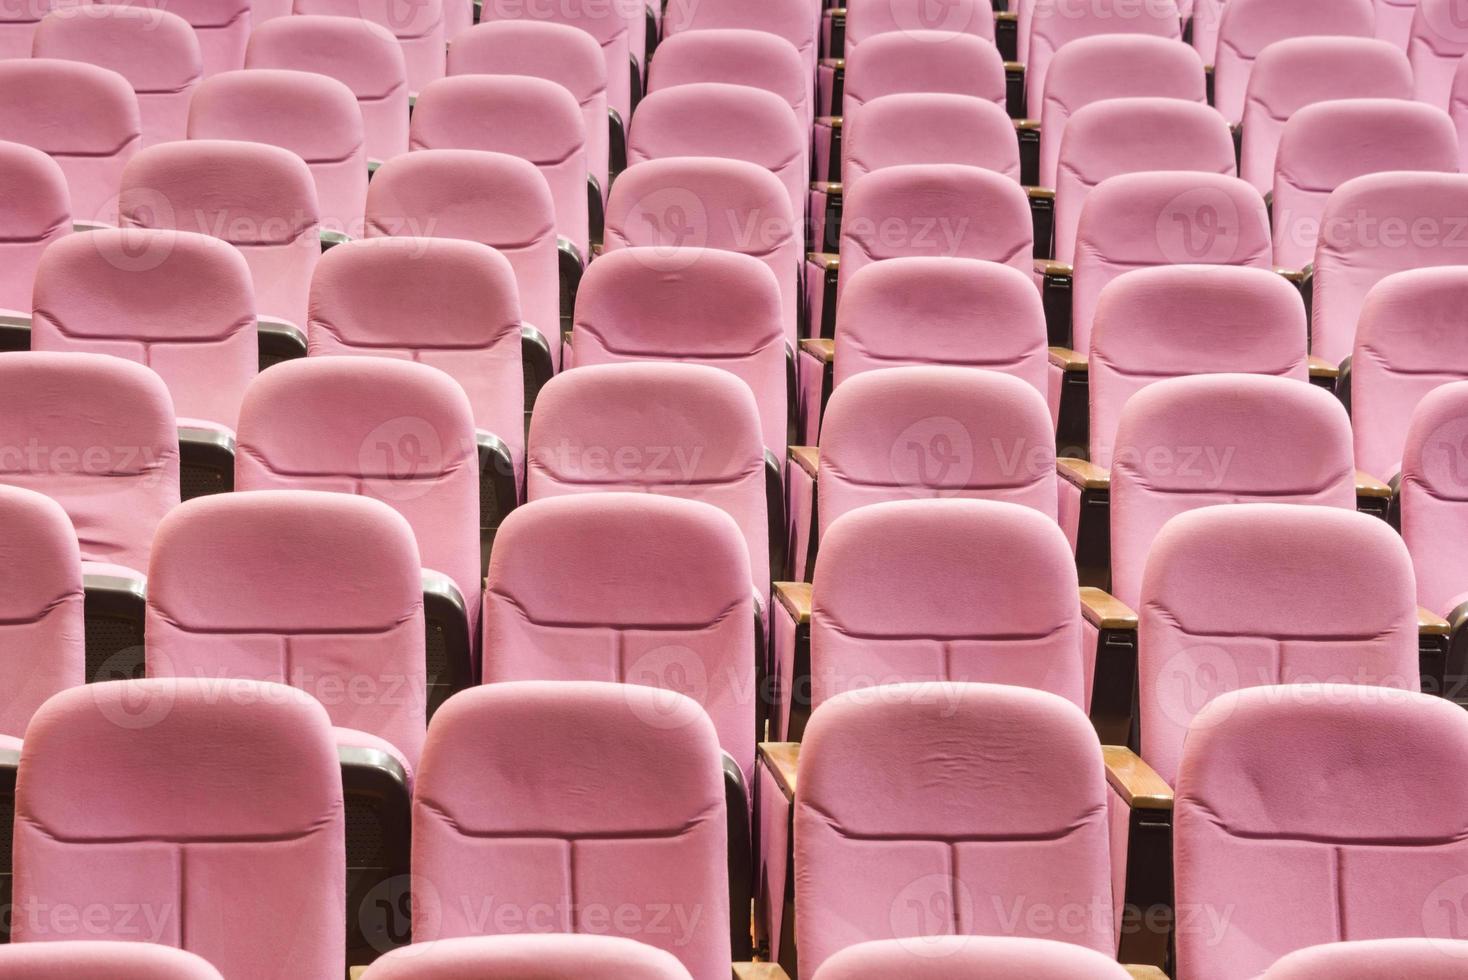 Movie Theatre photo